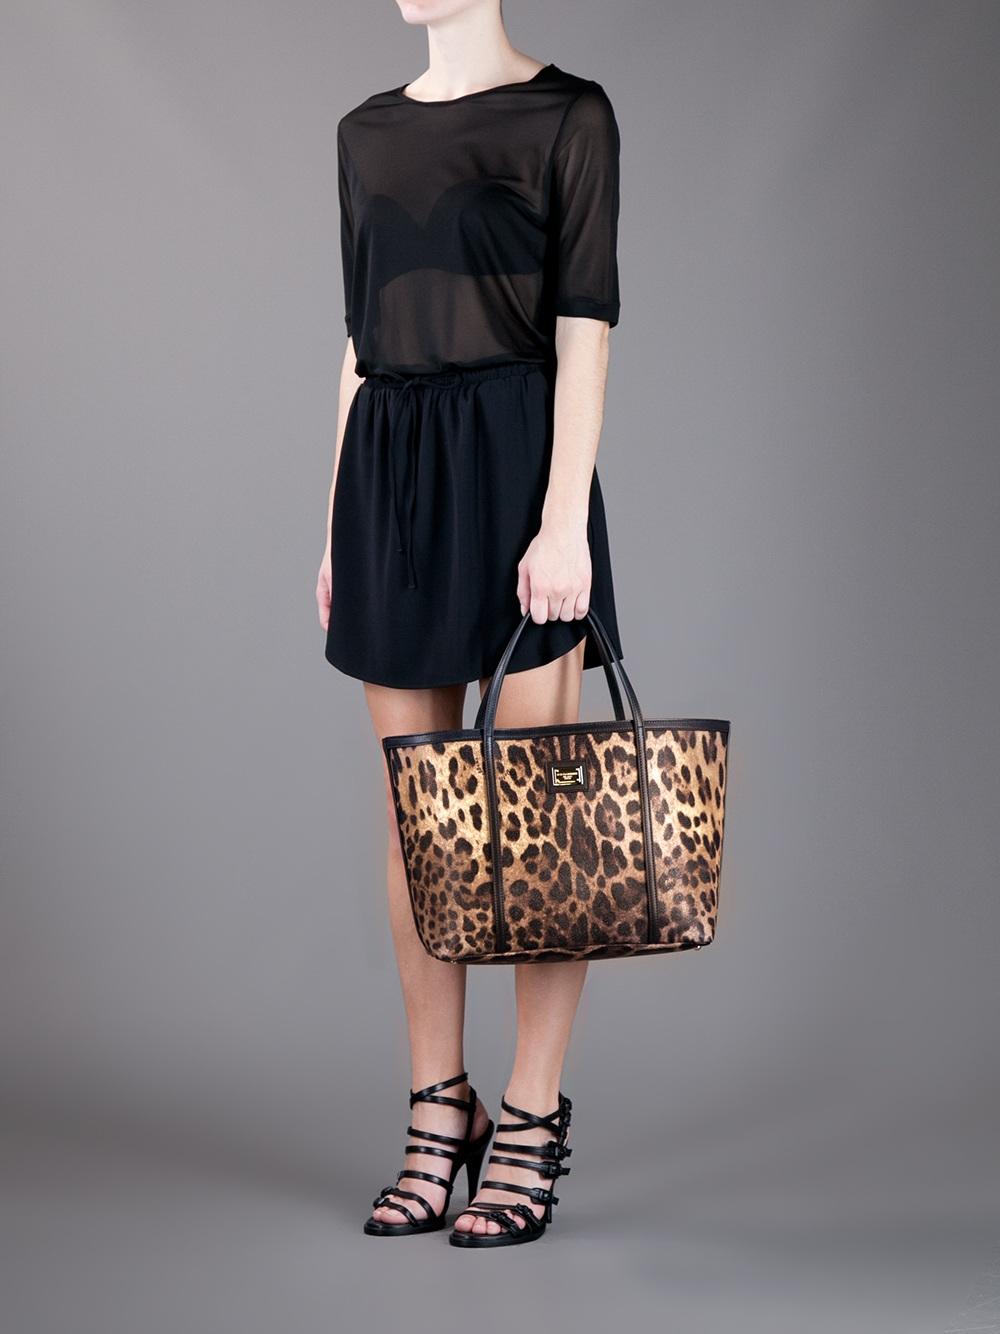 lyst dolce amp gabbana leopard shopping tote